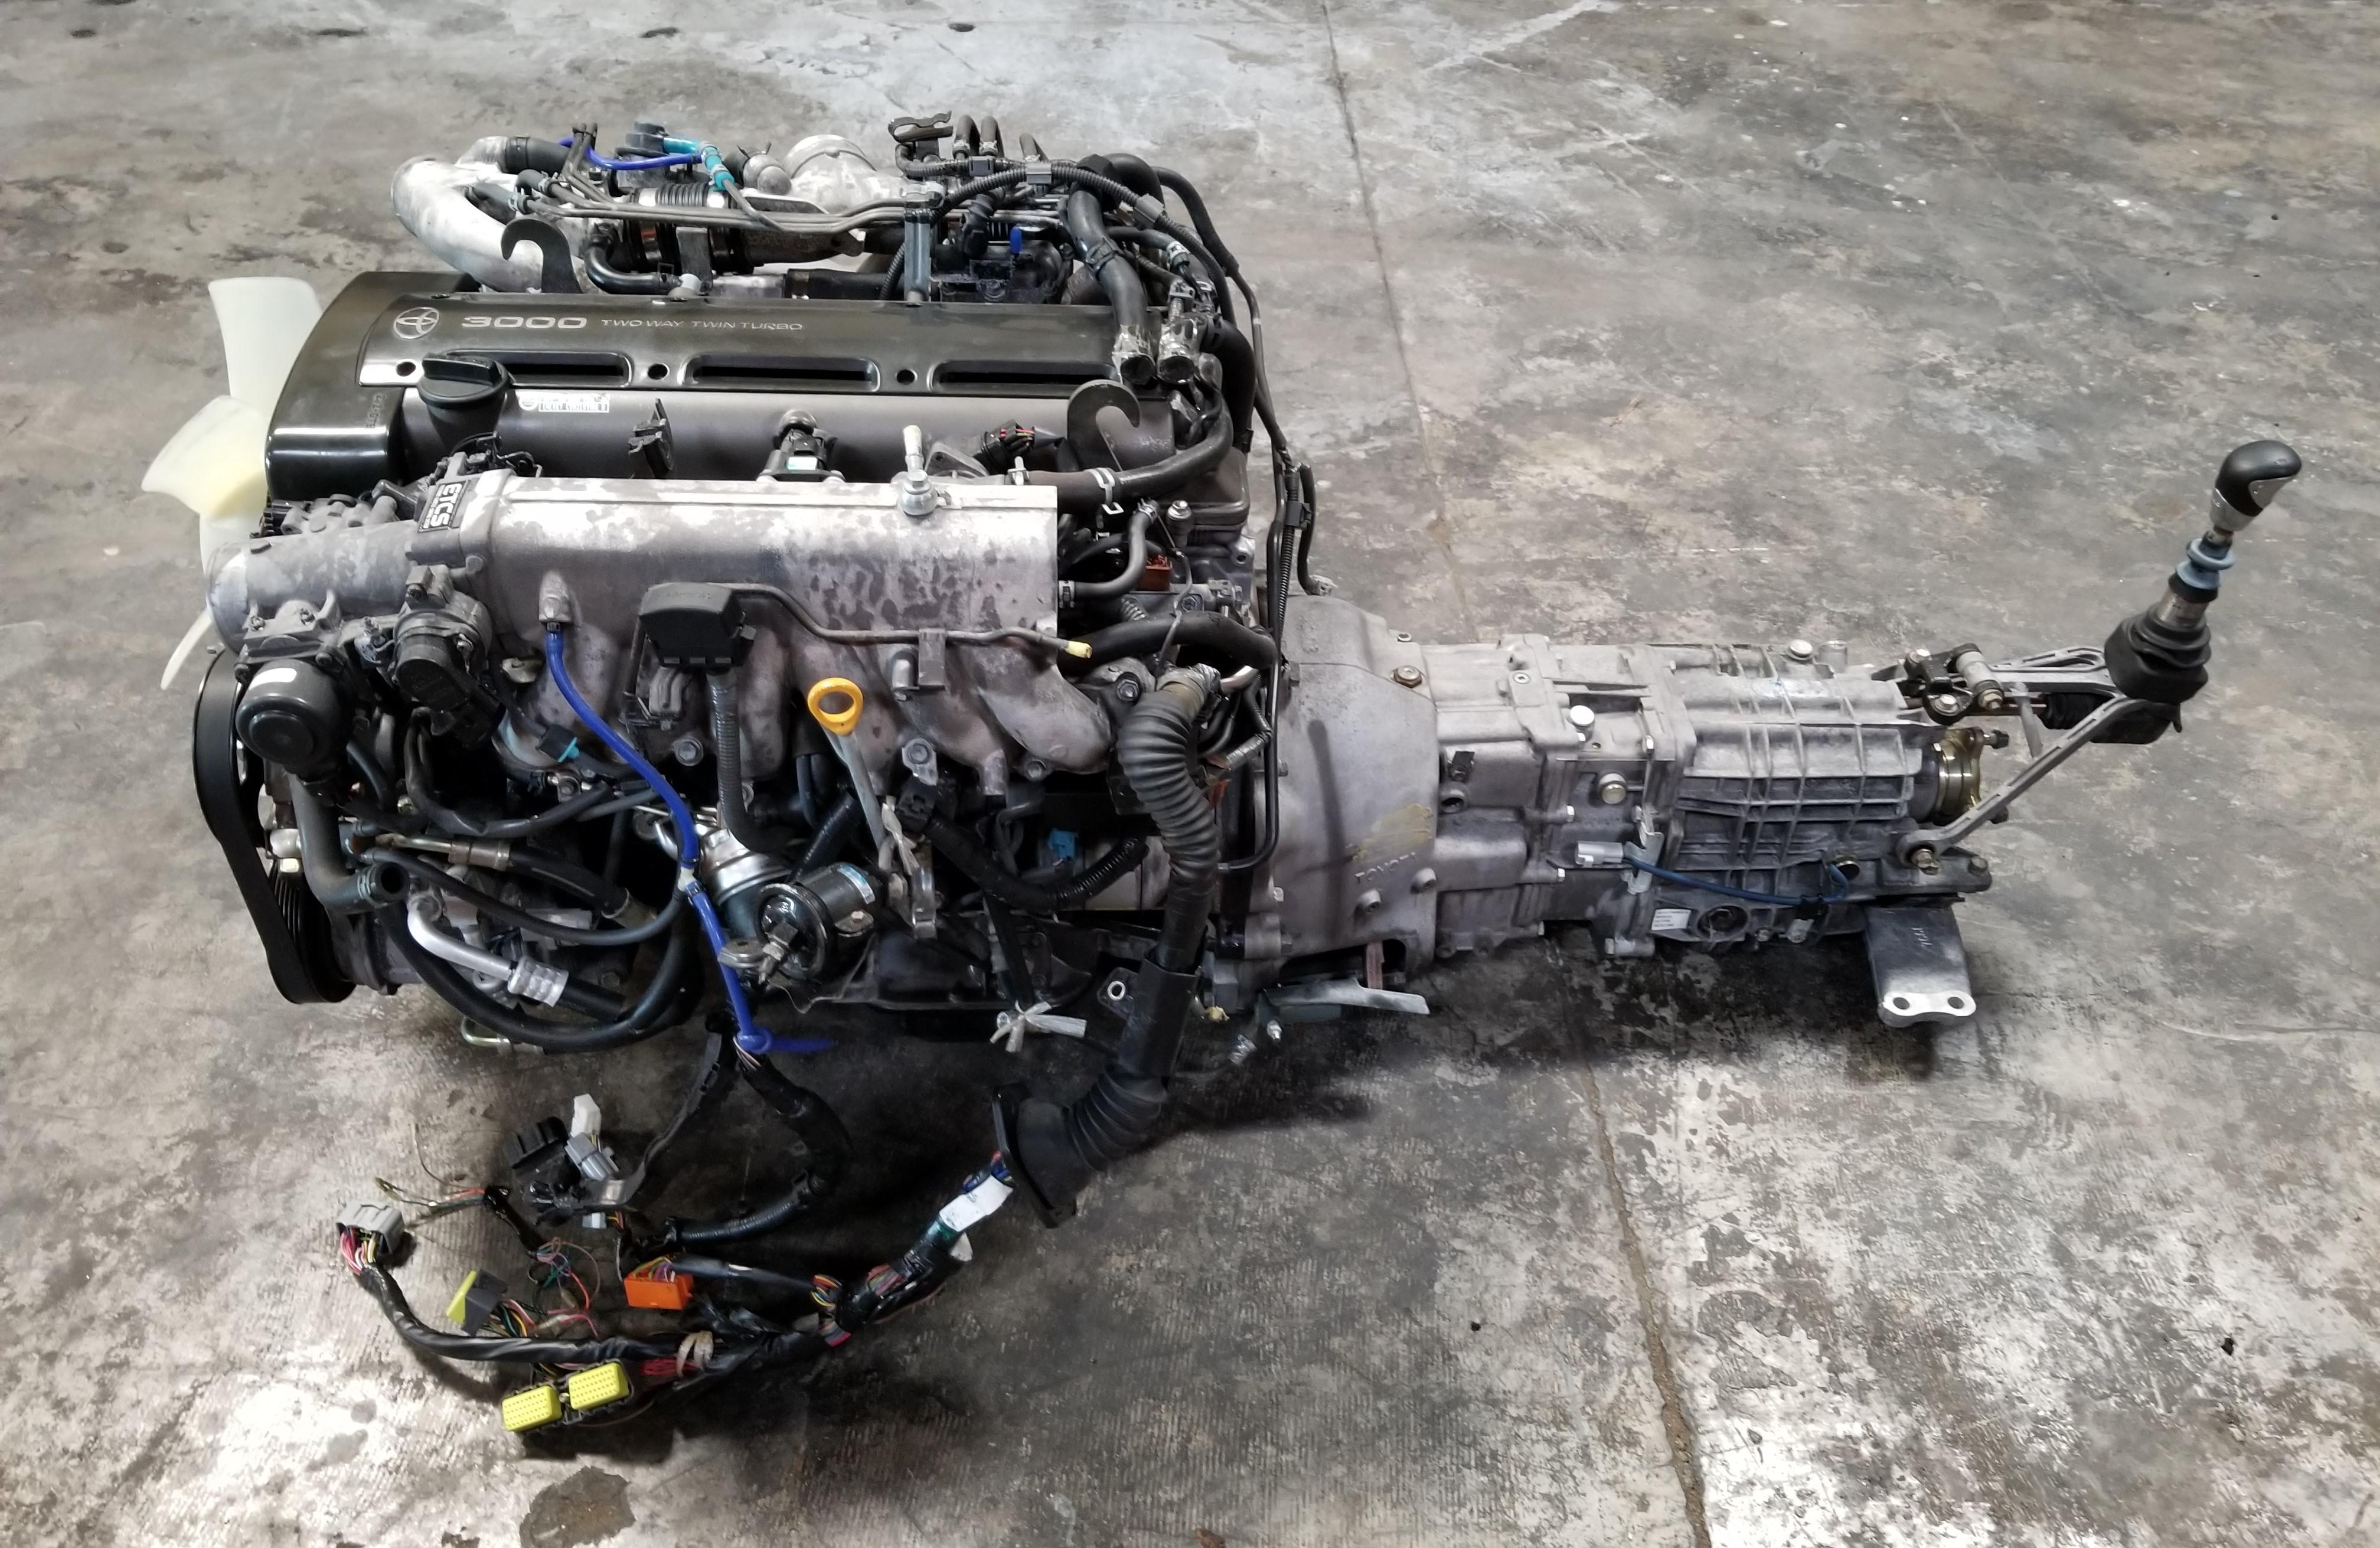 2JZGTE Non-VVTi Twin Turbo Rear Sump 3 0L Engine with V160 Getrag 6 Speed  Manual Transmission MK4 JZA80 Toyota Supra